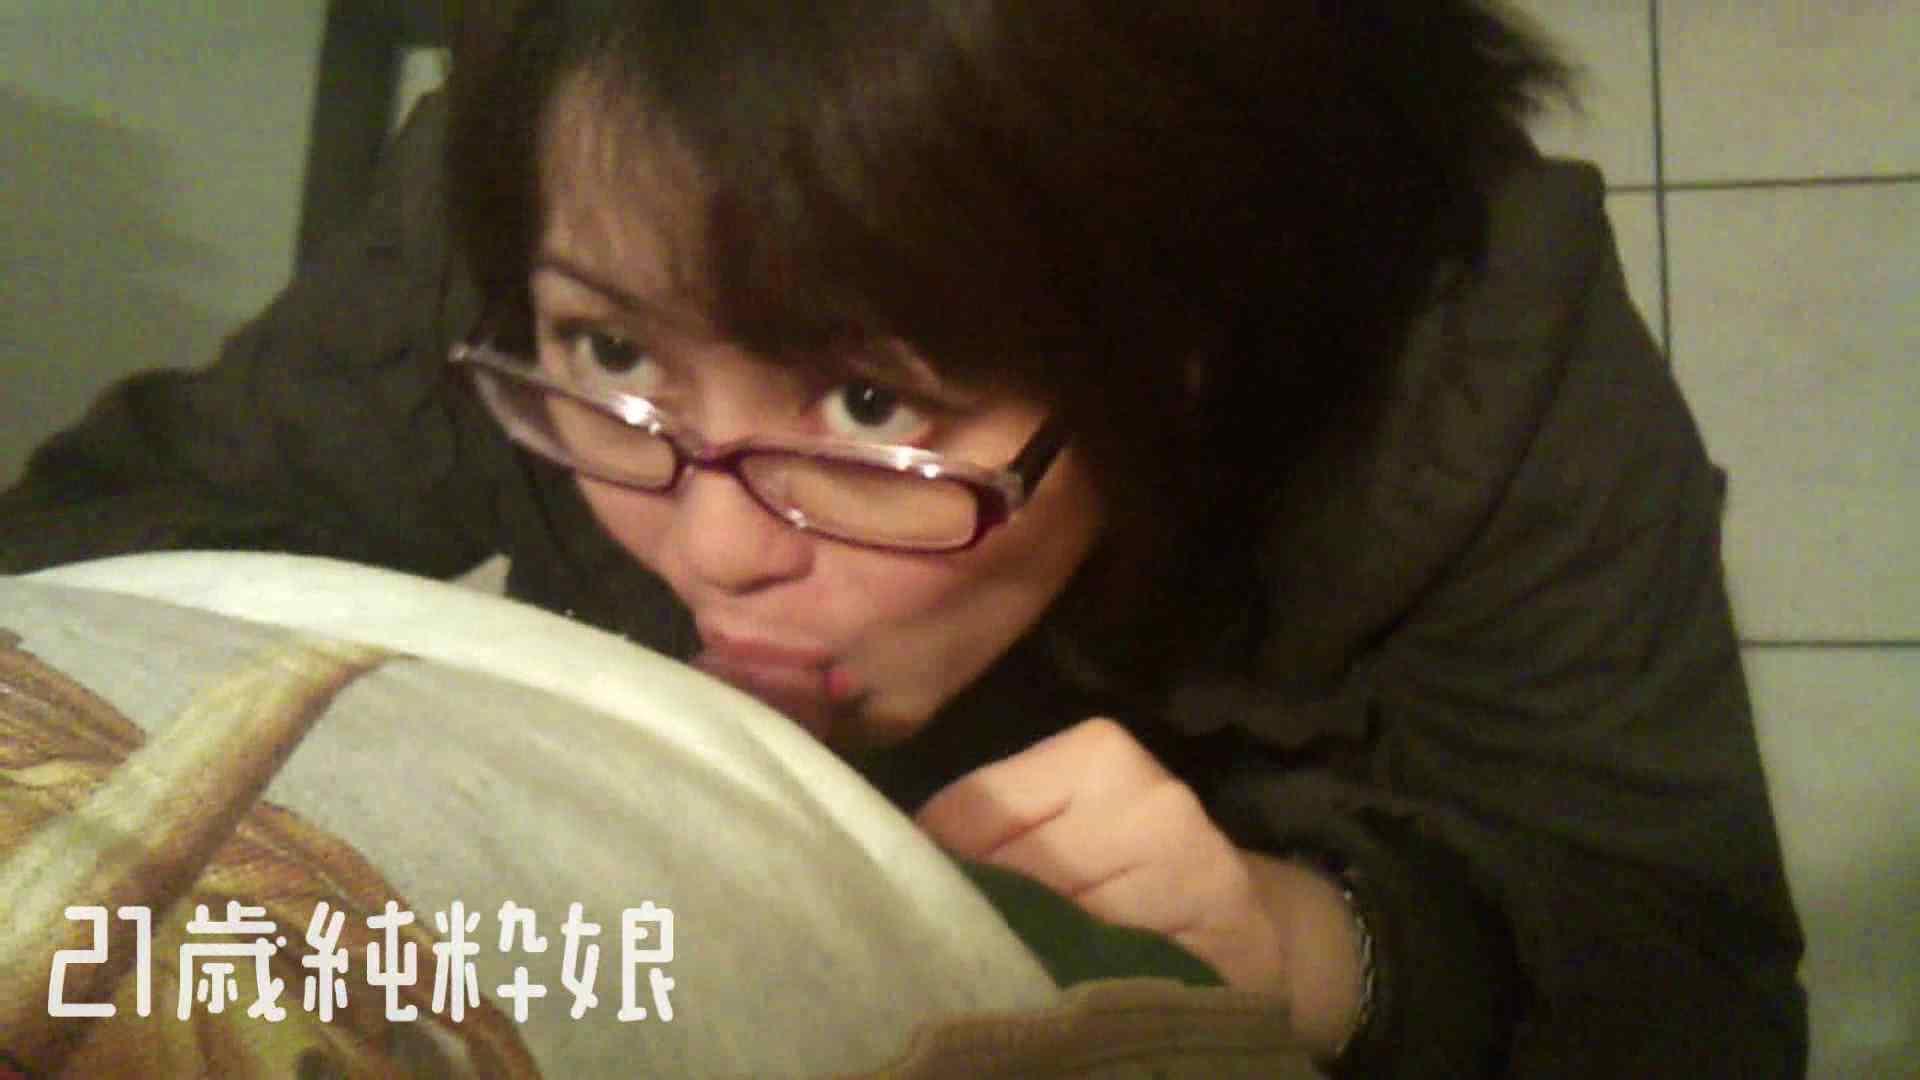 Gカップ21歳純粋嬢第2弾Vol.5 性欲丸出し | 学校  101pic 31